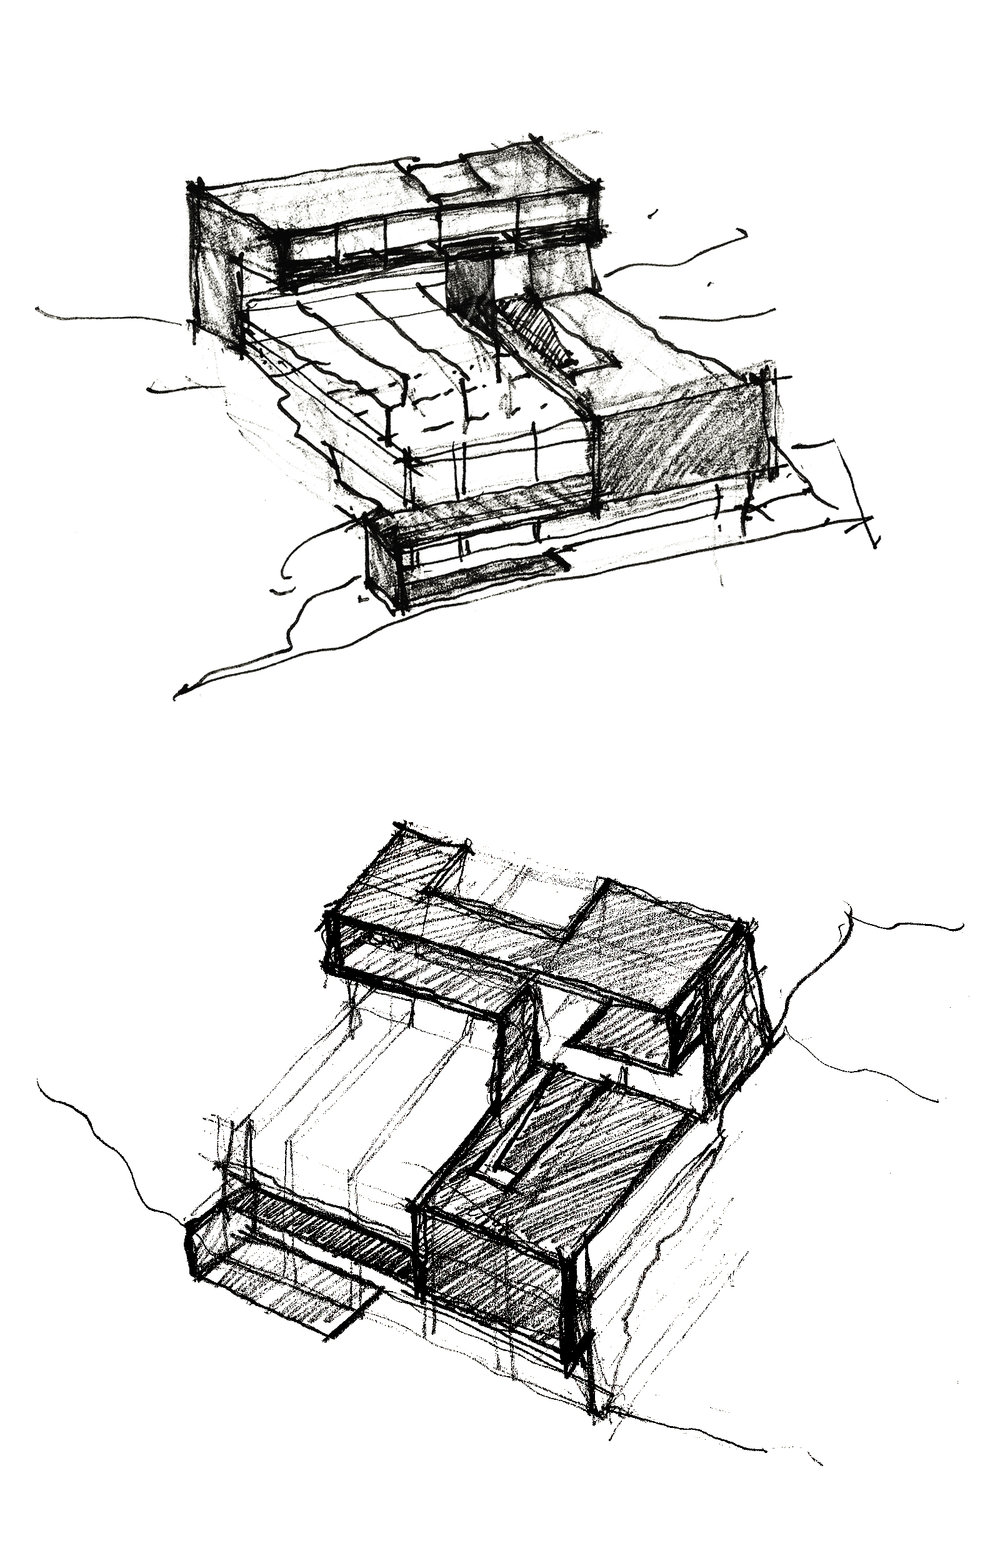 axon sketch.jpg